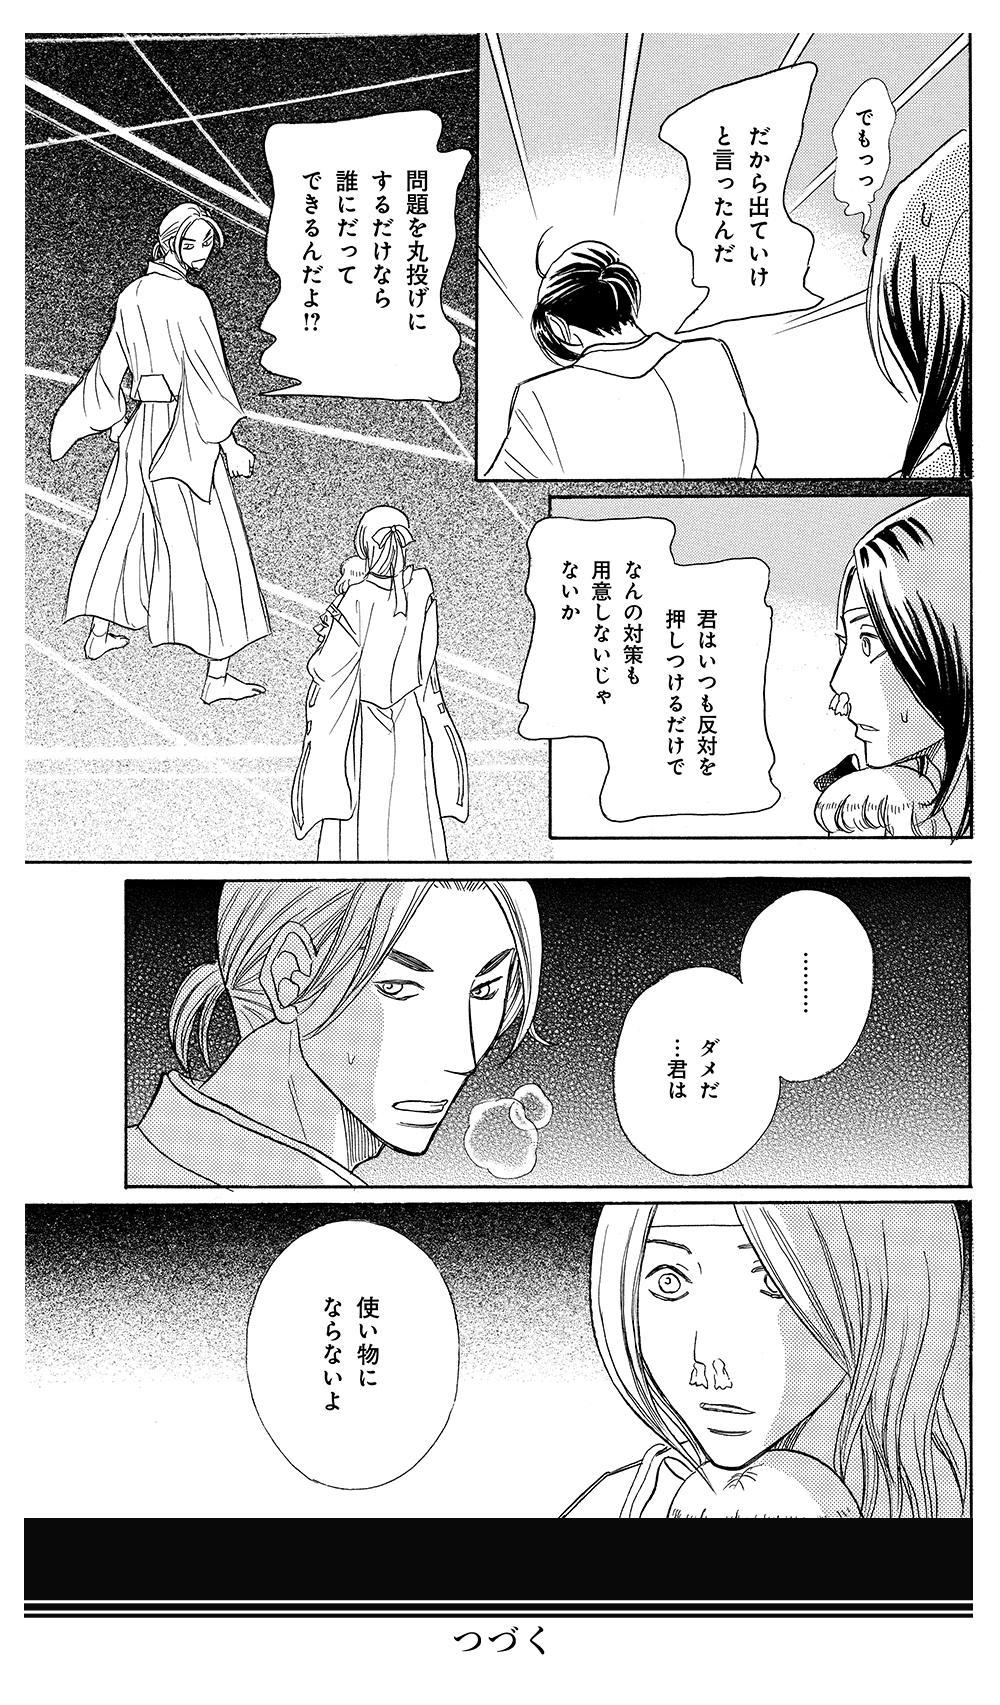 ijyuintukimaru-089.jpg